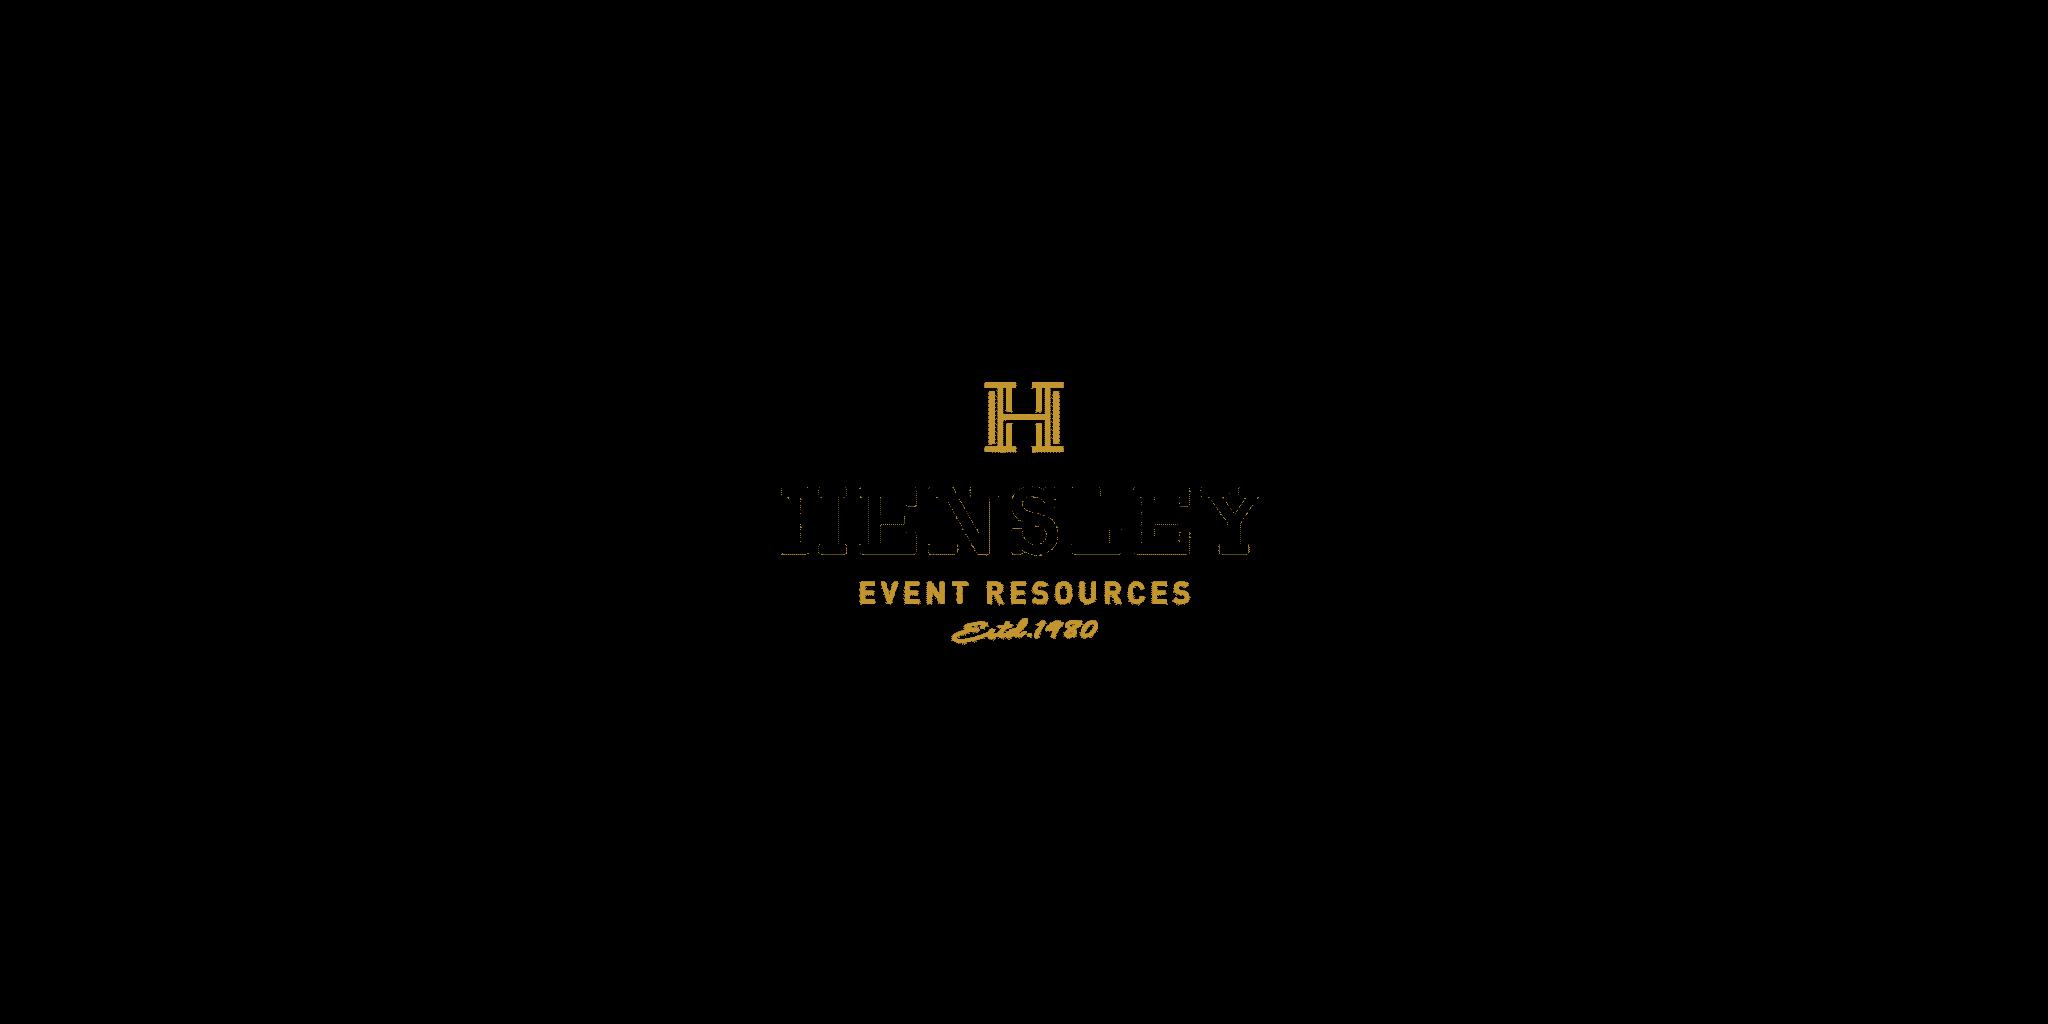 OPEN HOUSE 02